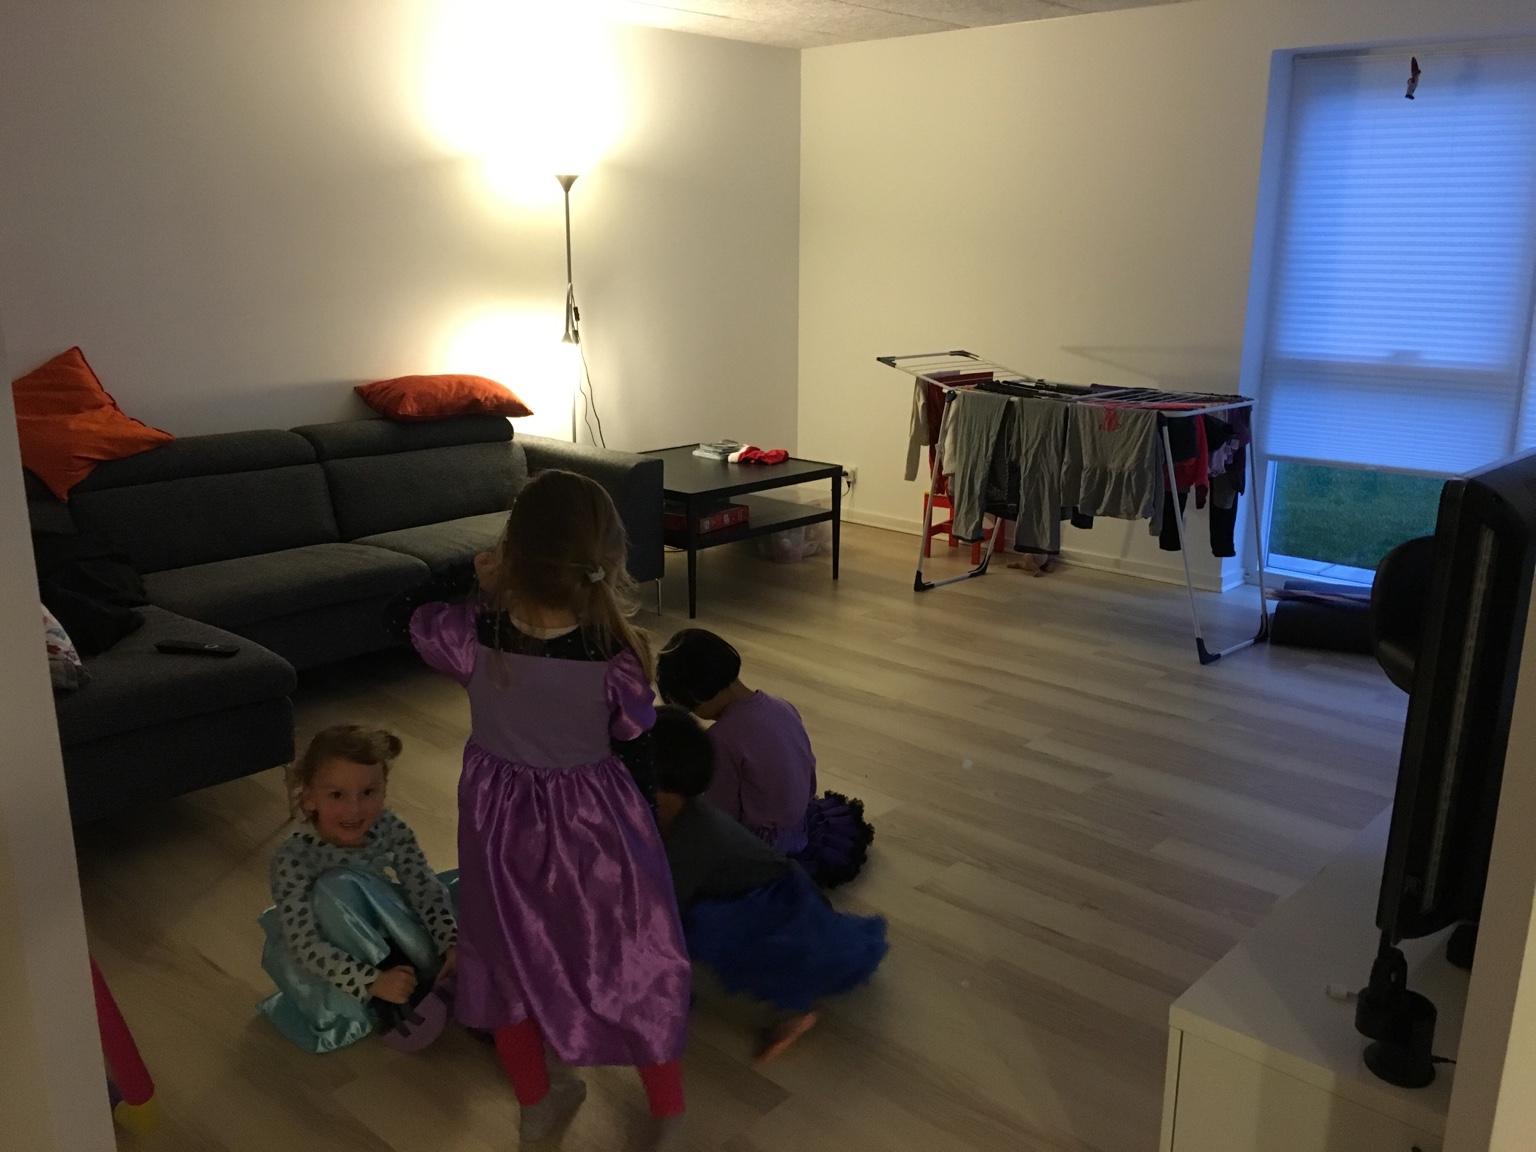 Ordentligt lys til stuen - Slyngebarn